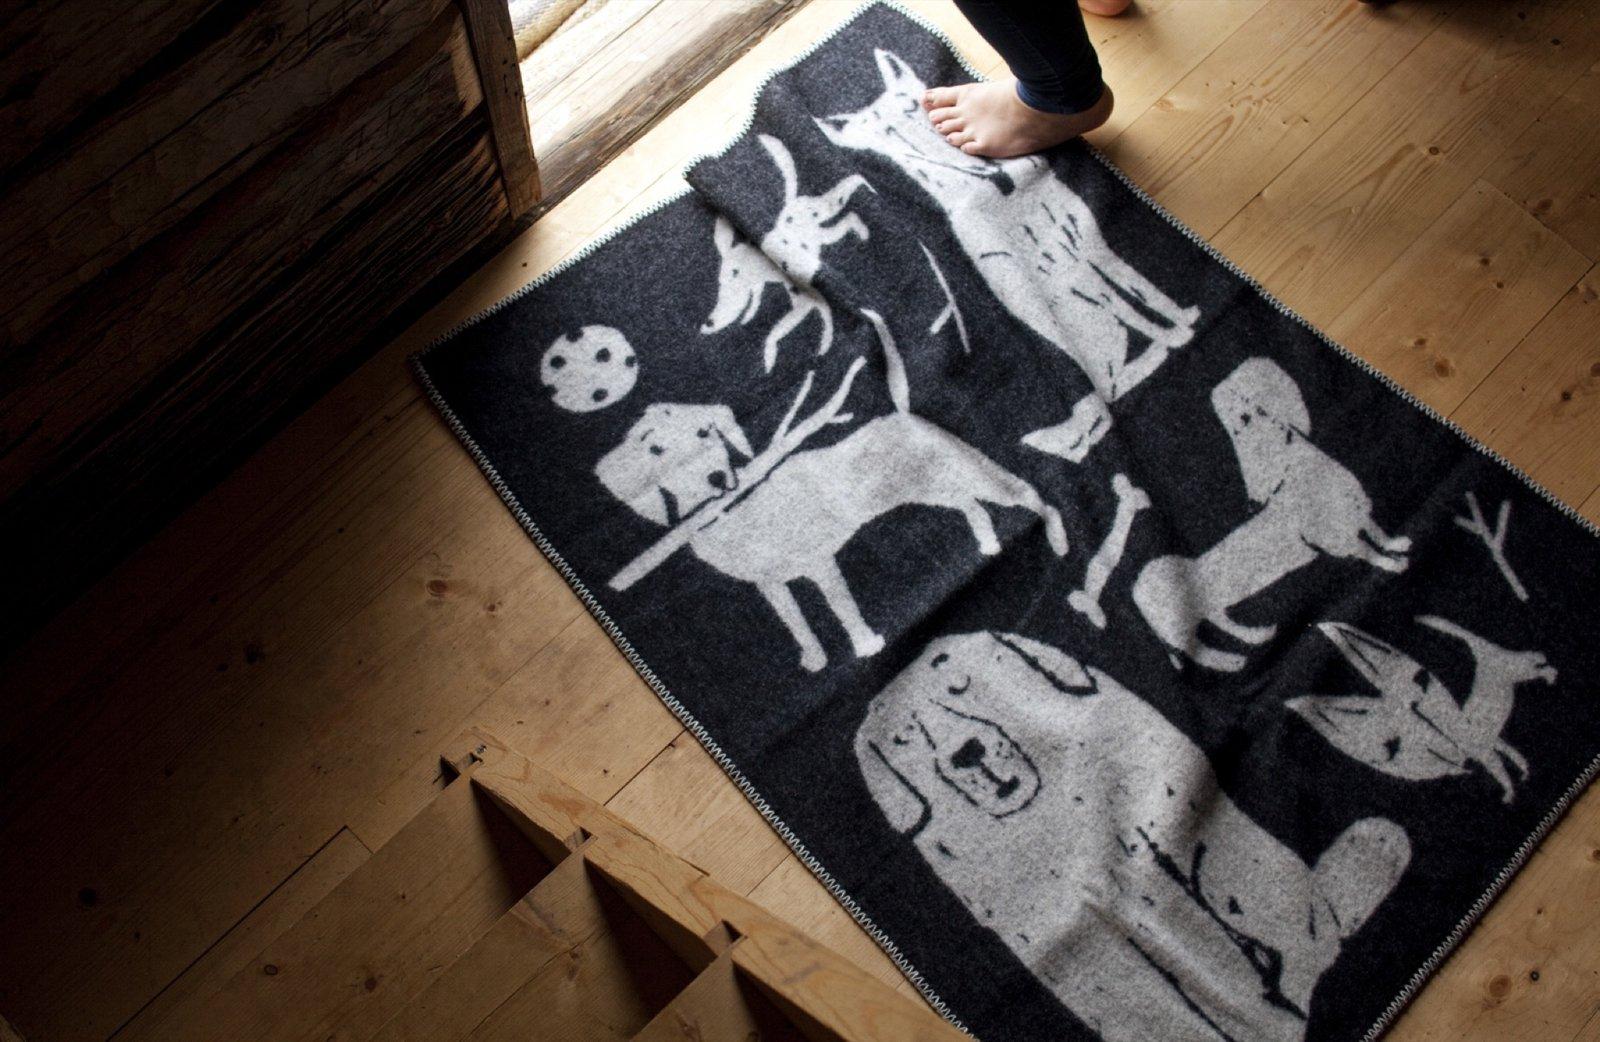 Lapuan Kankurit KOIRAPUISTO wool blanket  Photo 18 of 20 in The Weavers of Lapua